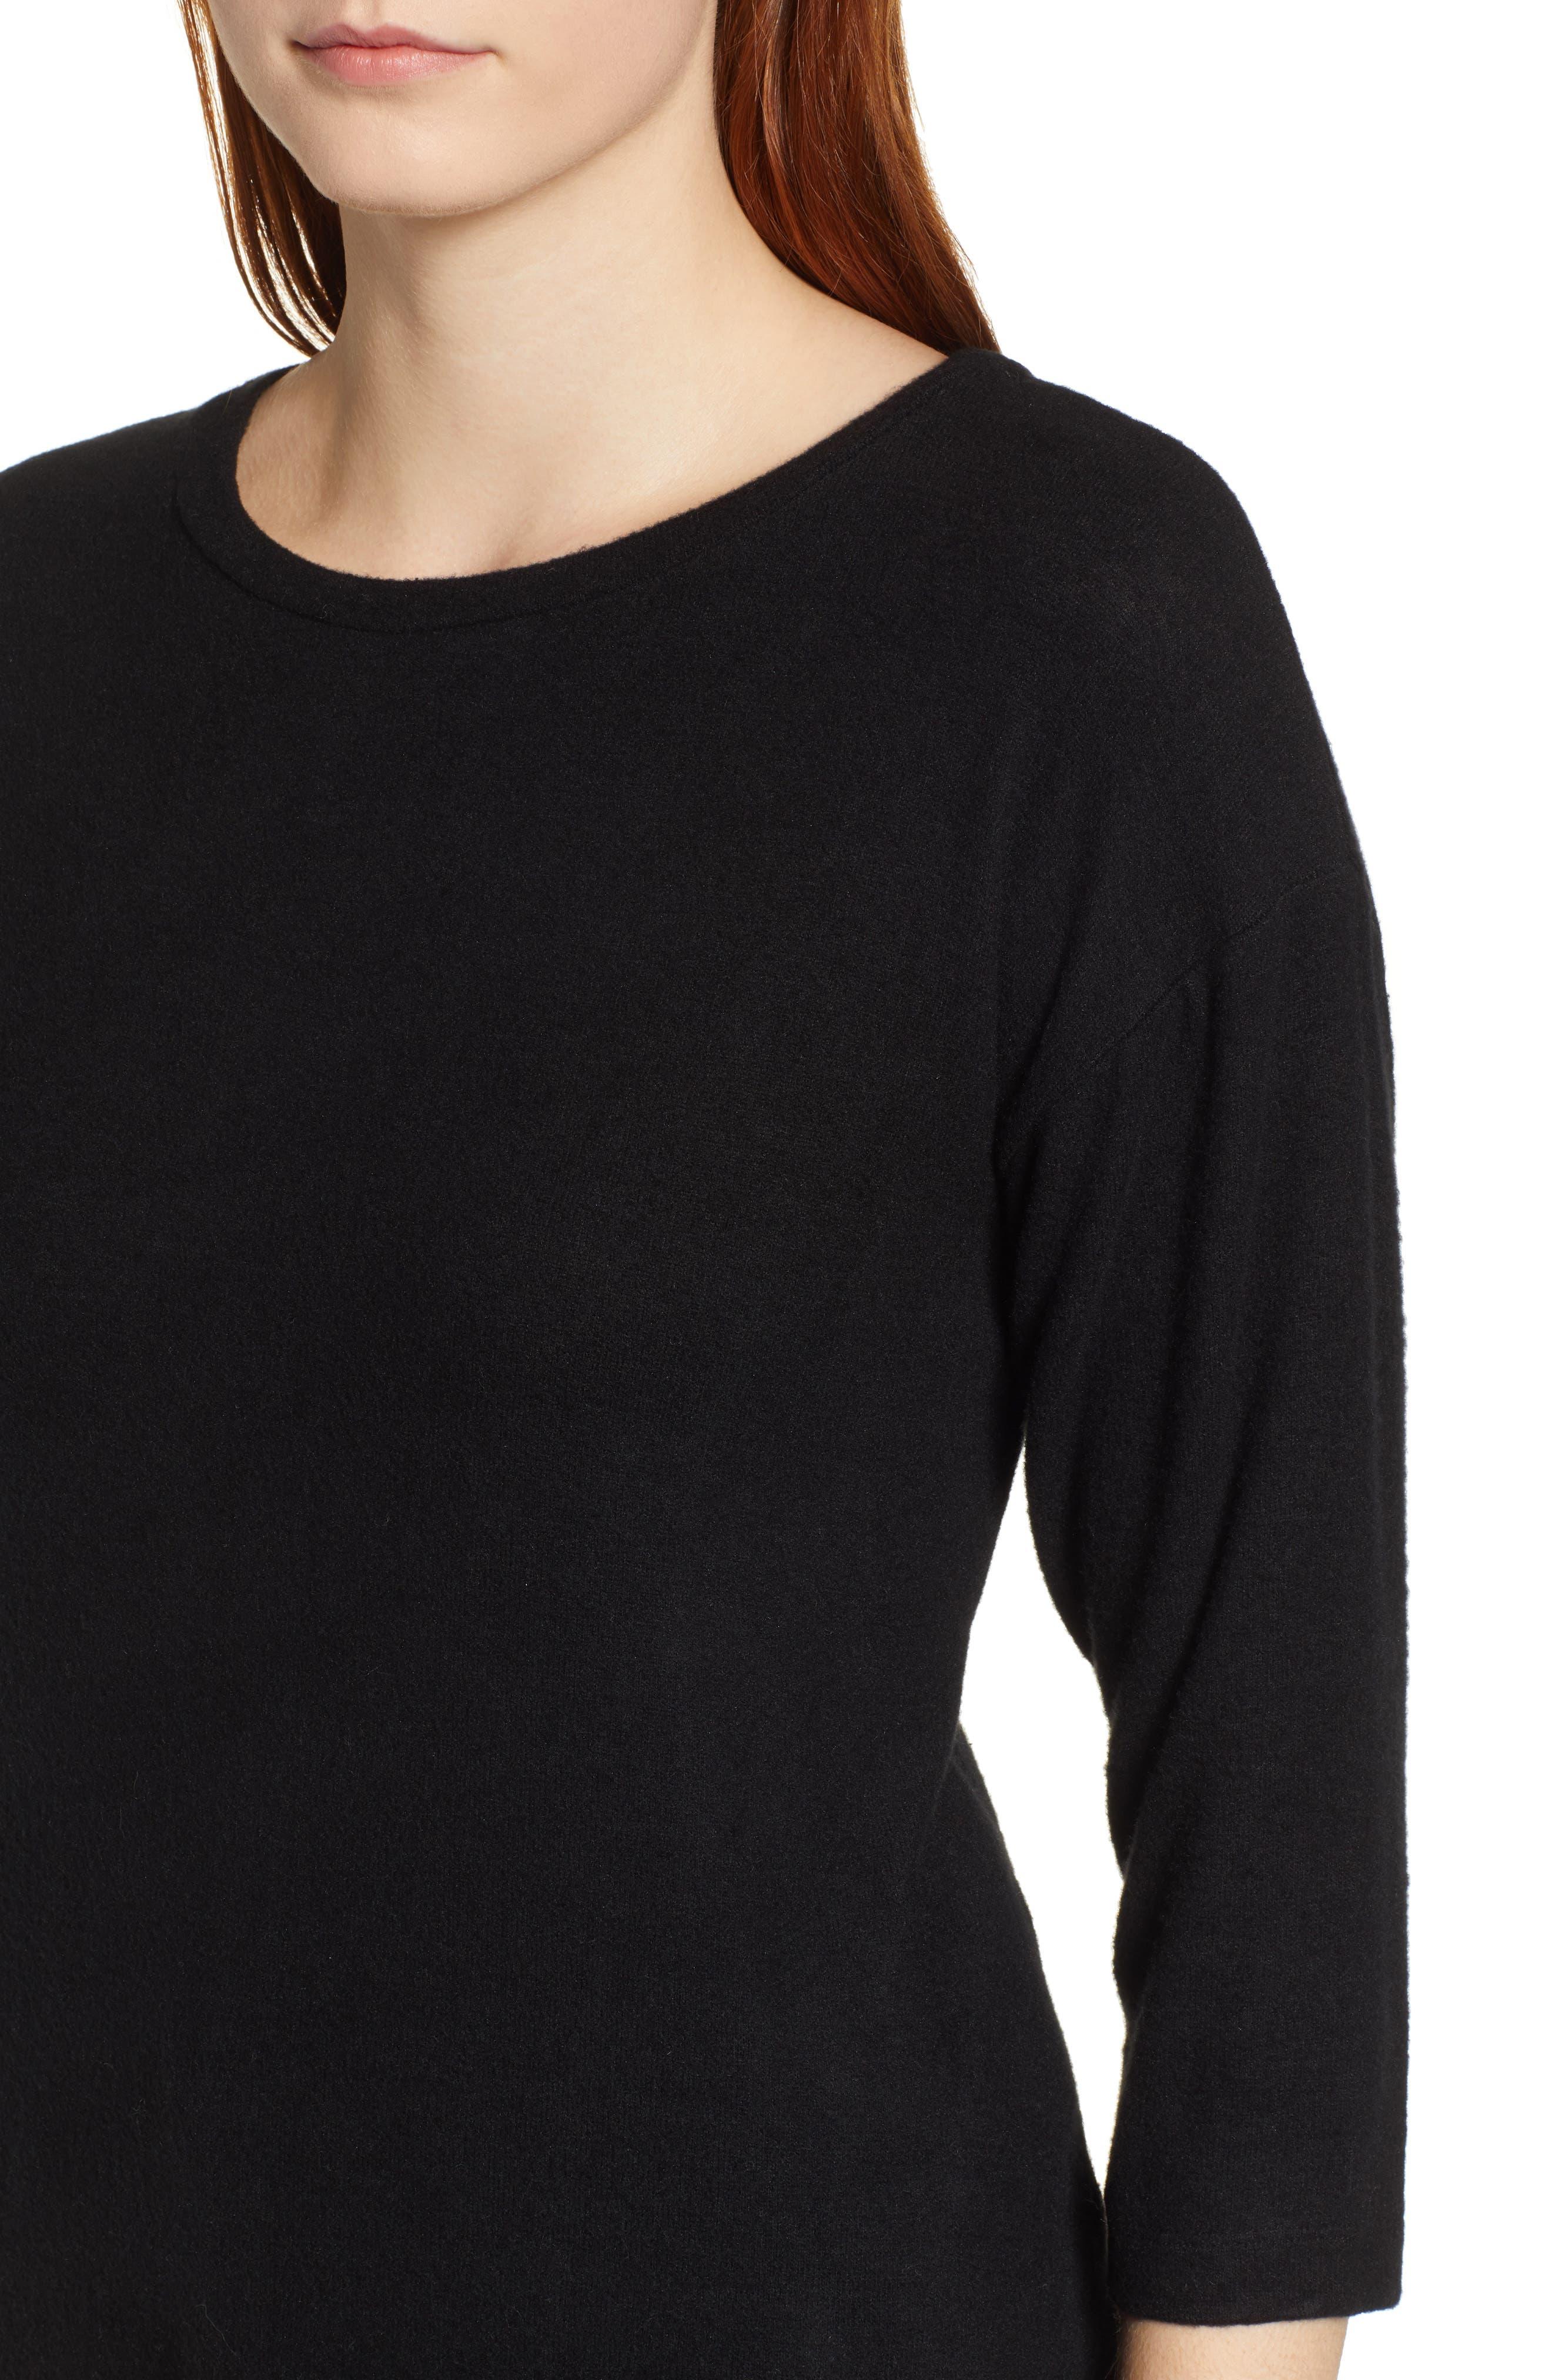 BOBEAU,                             Pleat Back Pullover,                             Alternate thumbnail 4, color,                             001